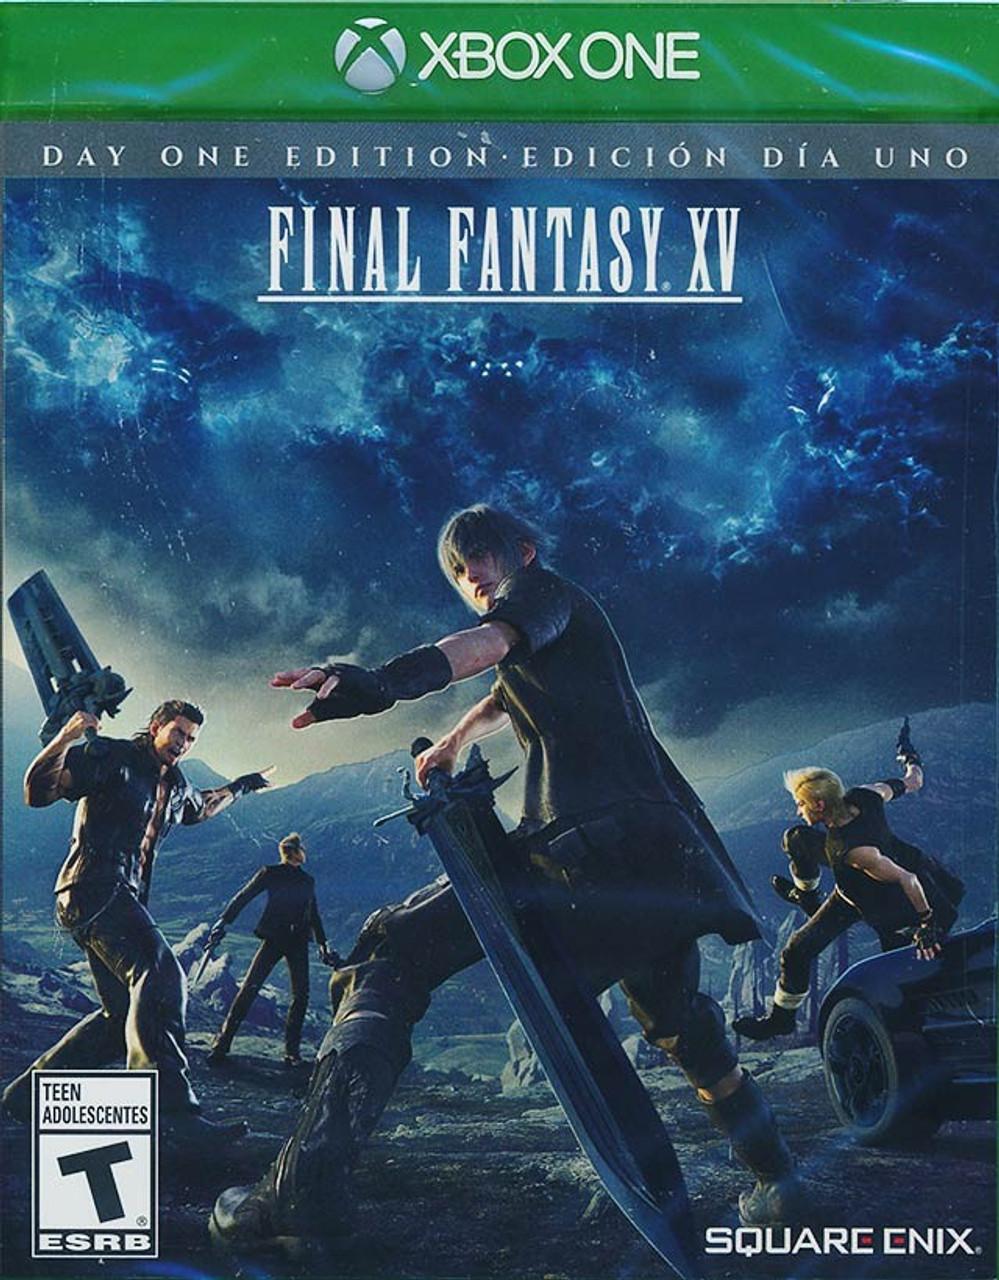 final fantasy xv day